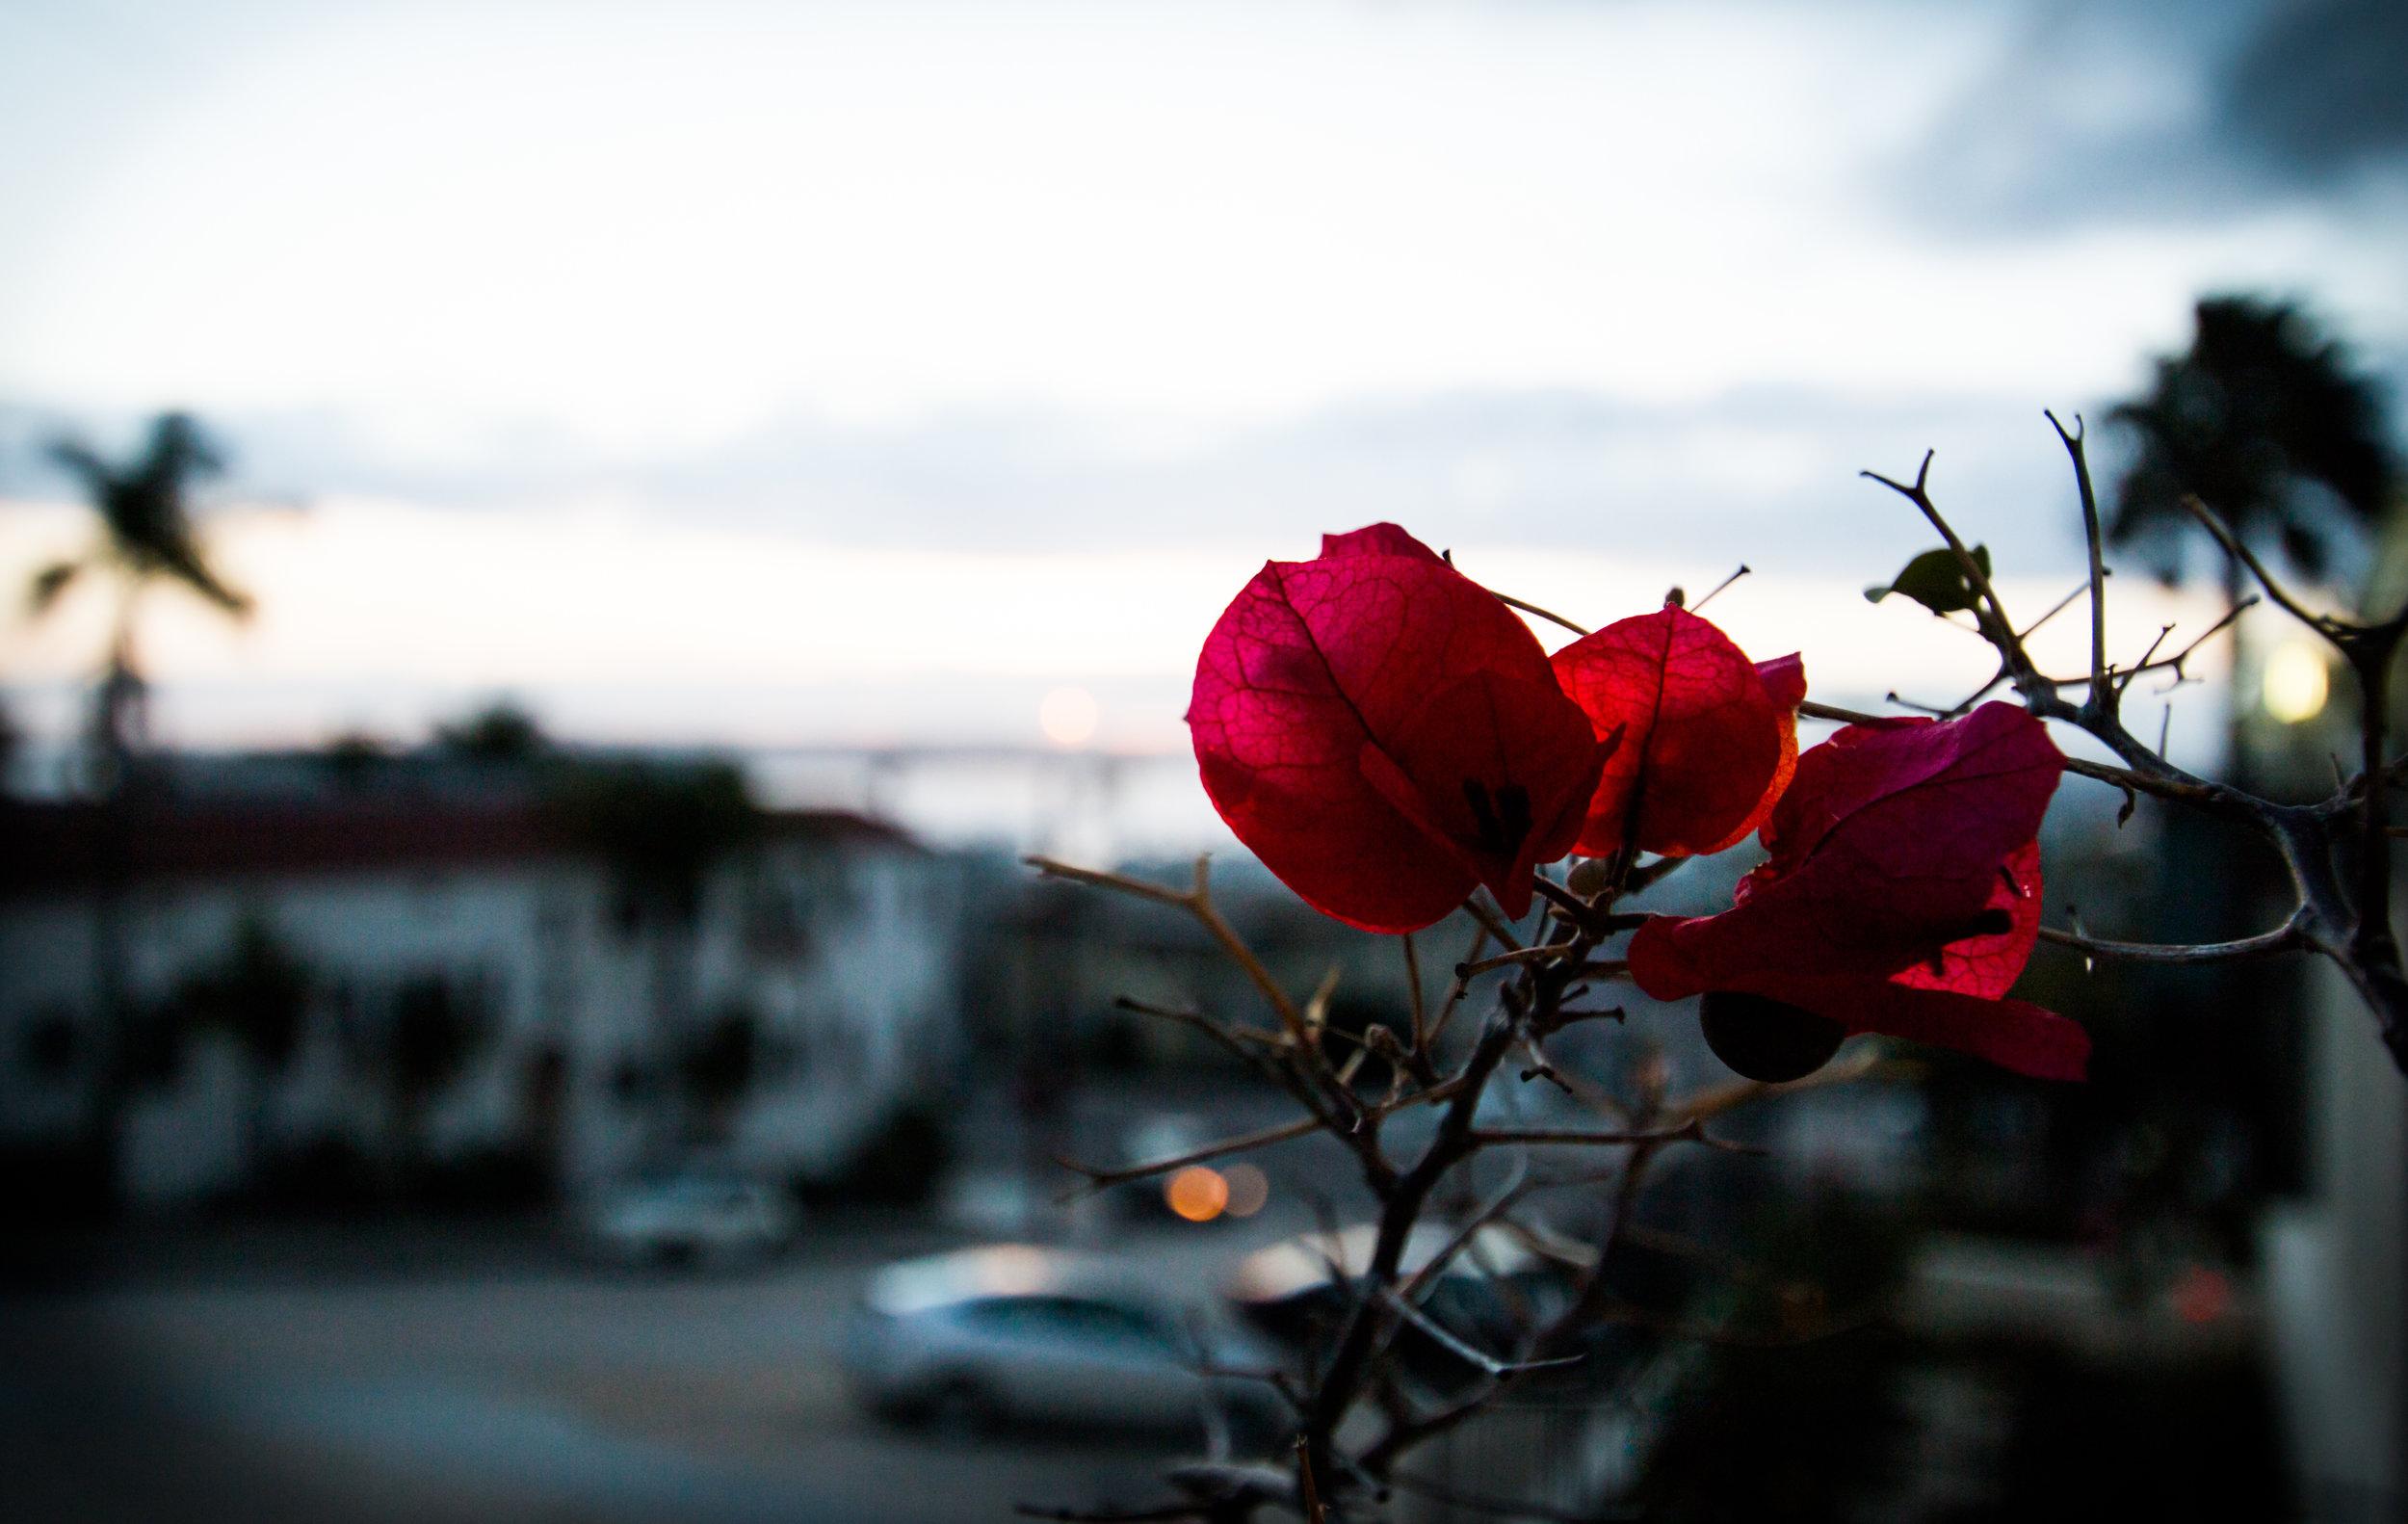 11_sunset_callie_mel_1612223.jpg